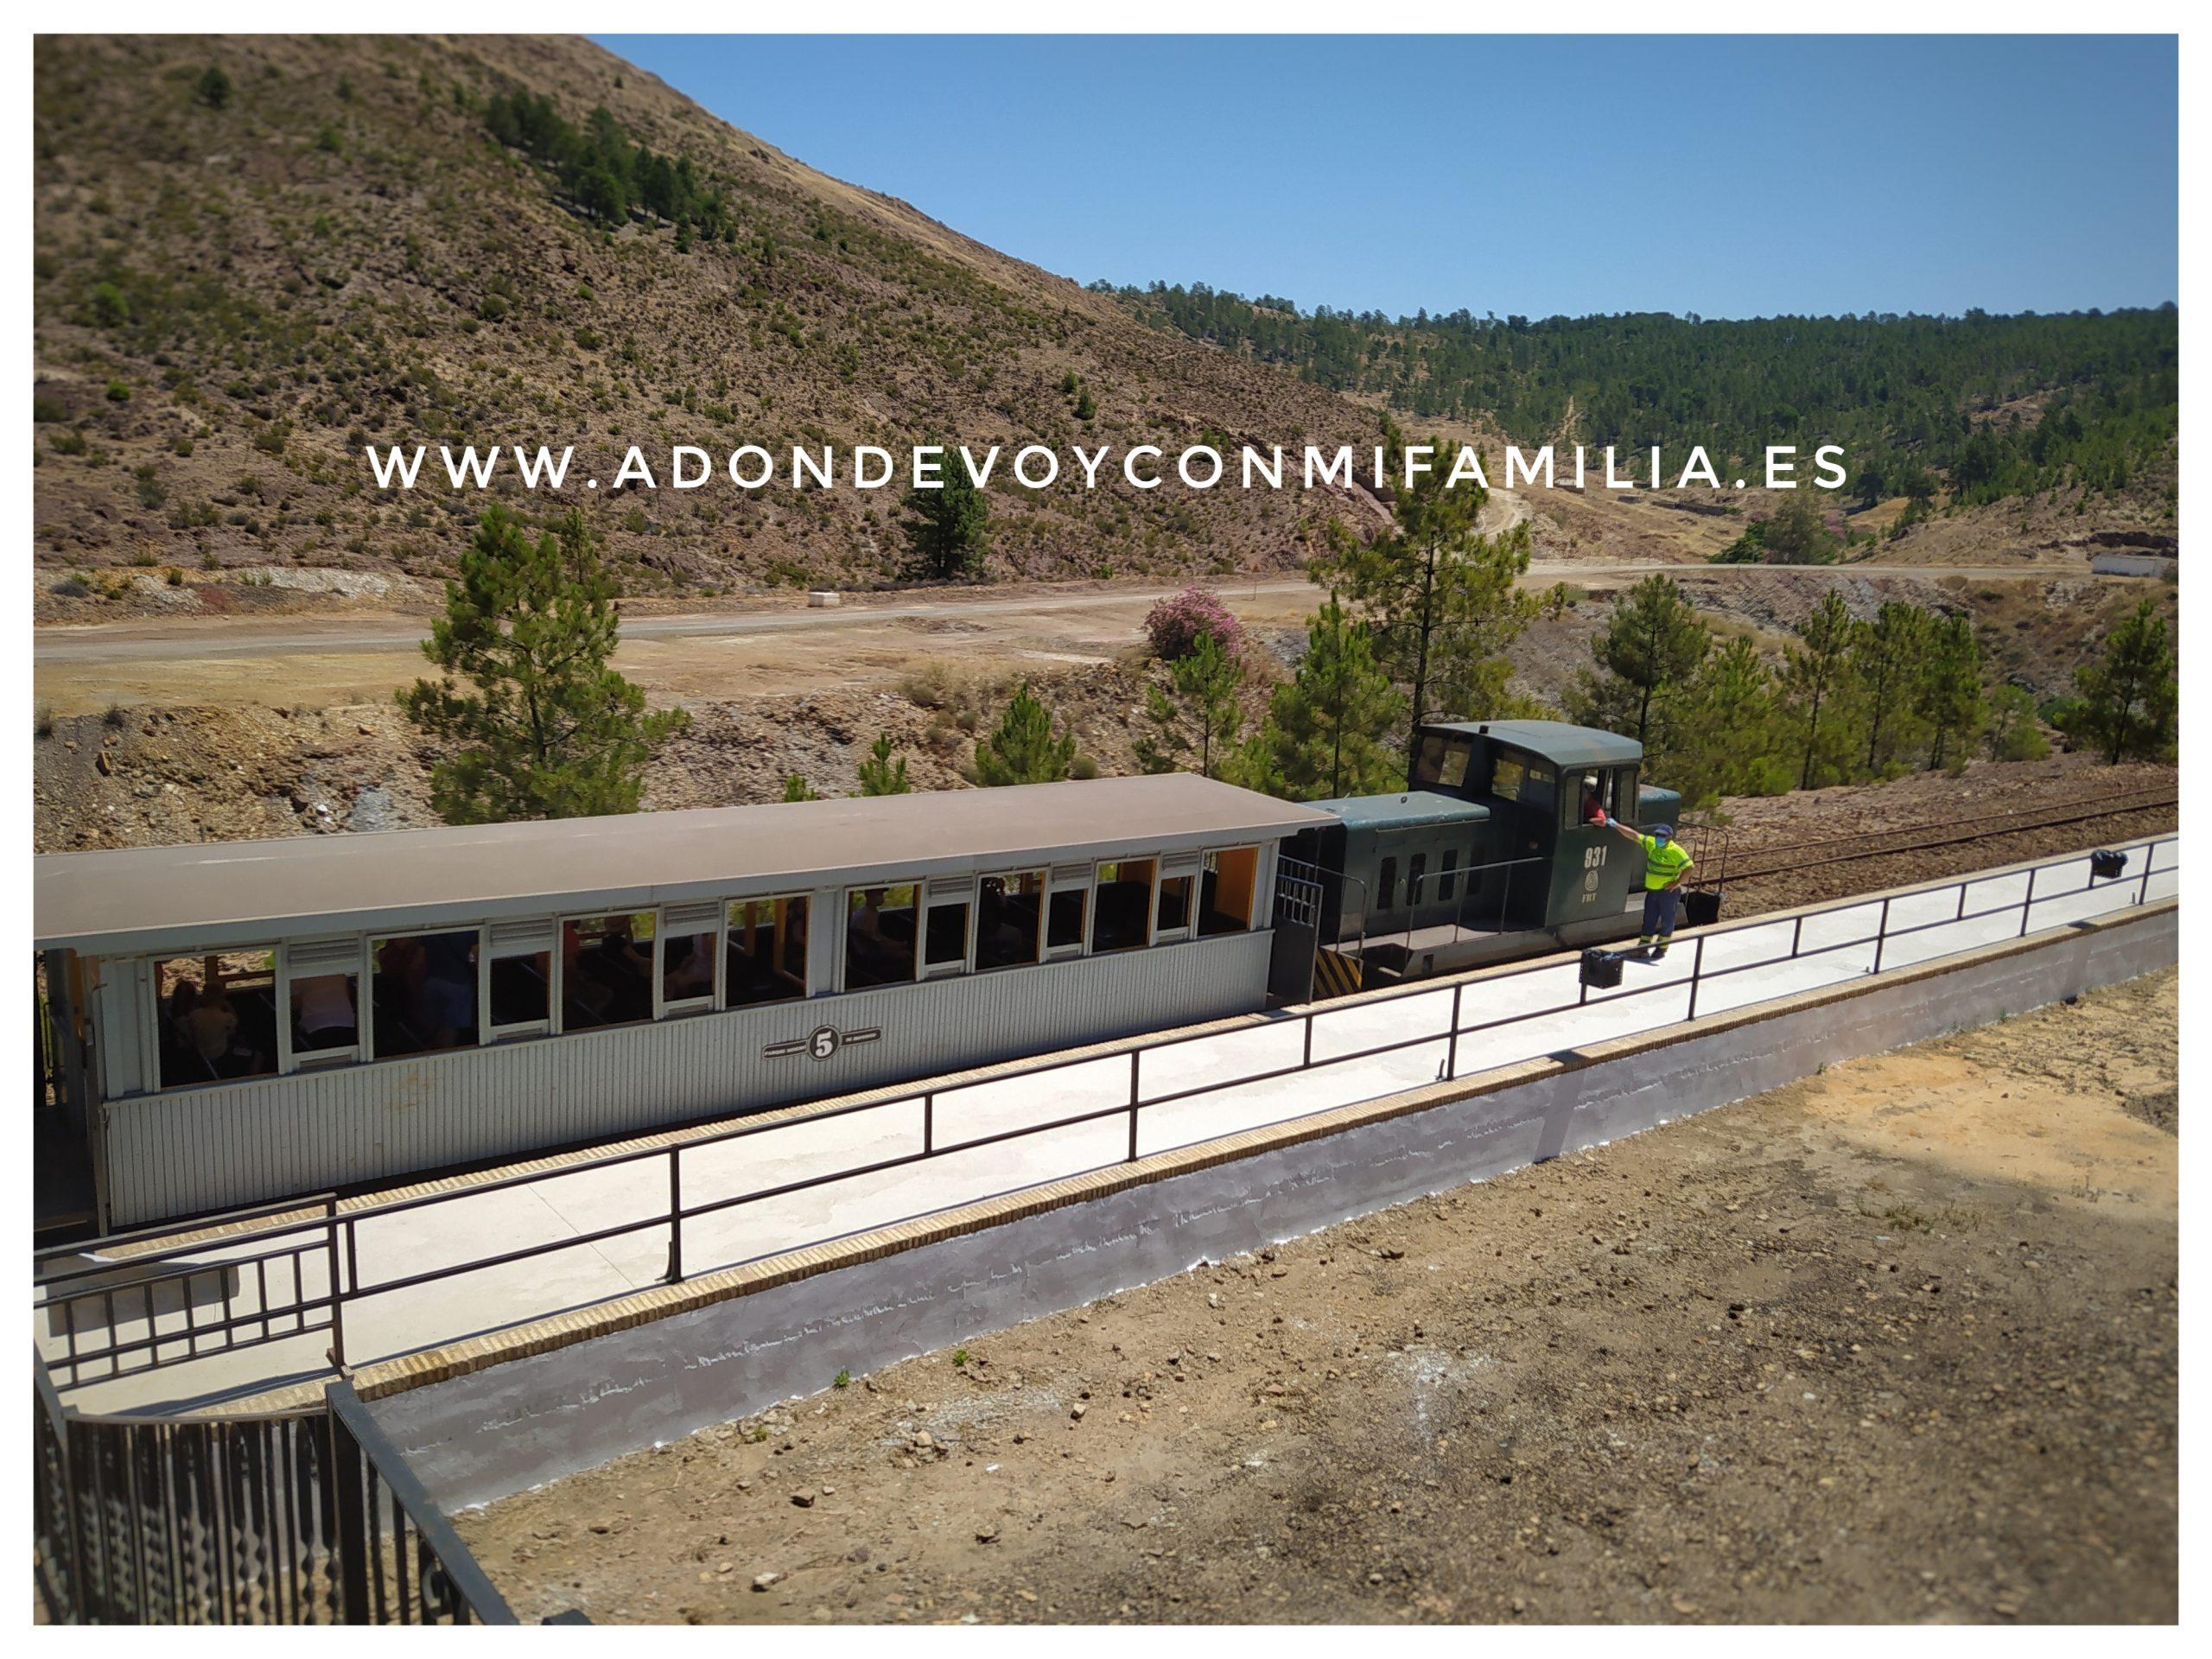 tren minero rio tinto 01